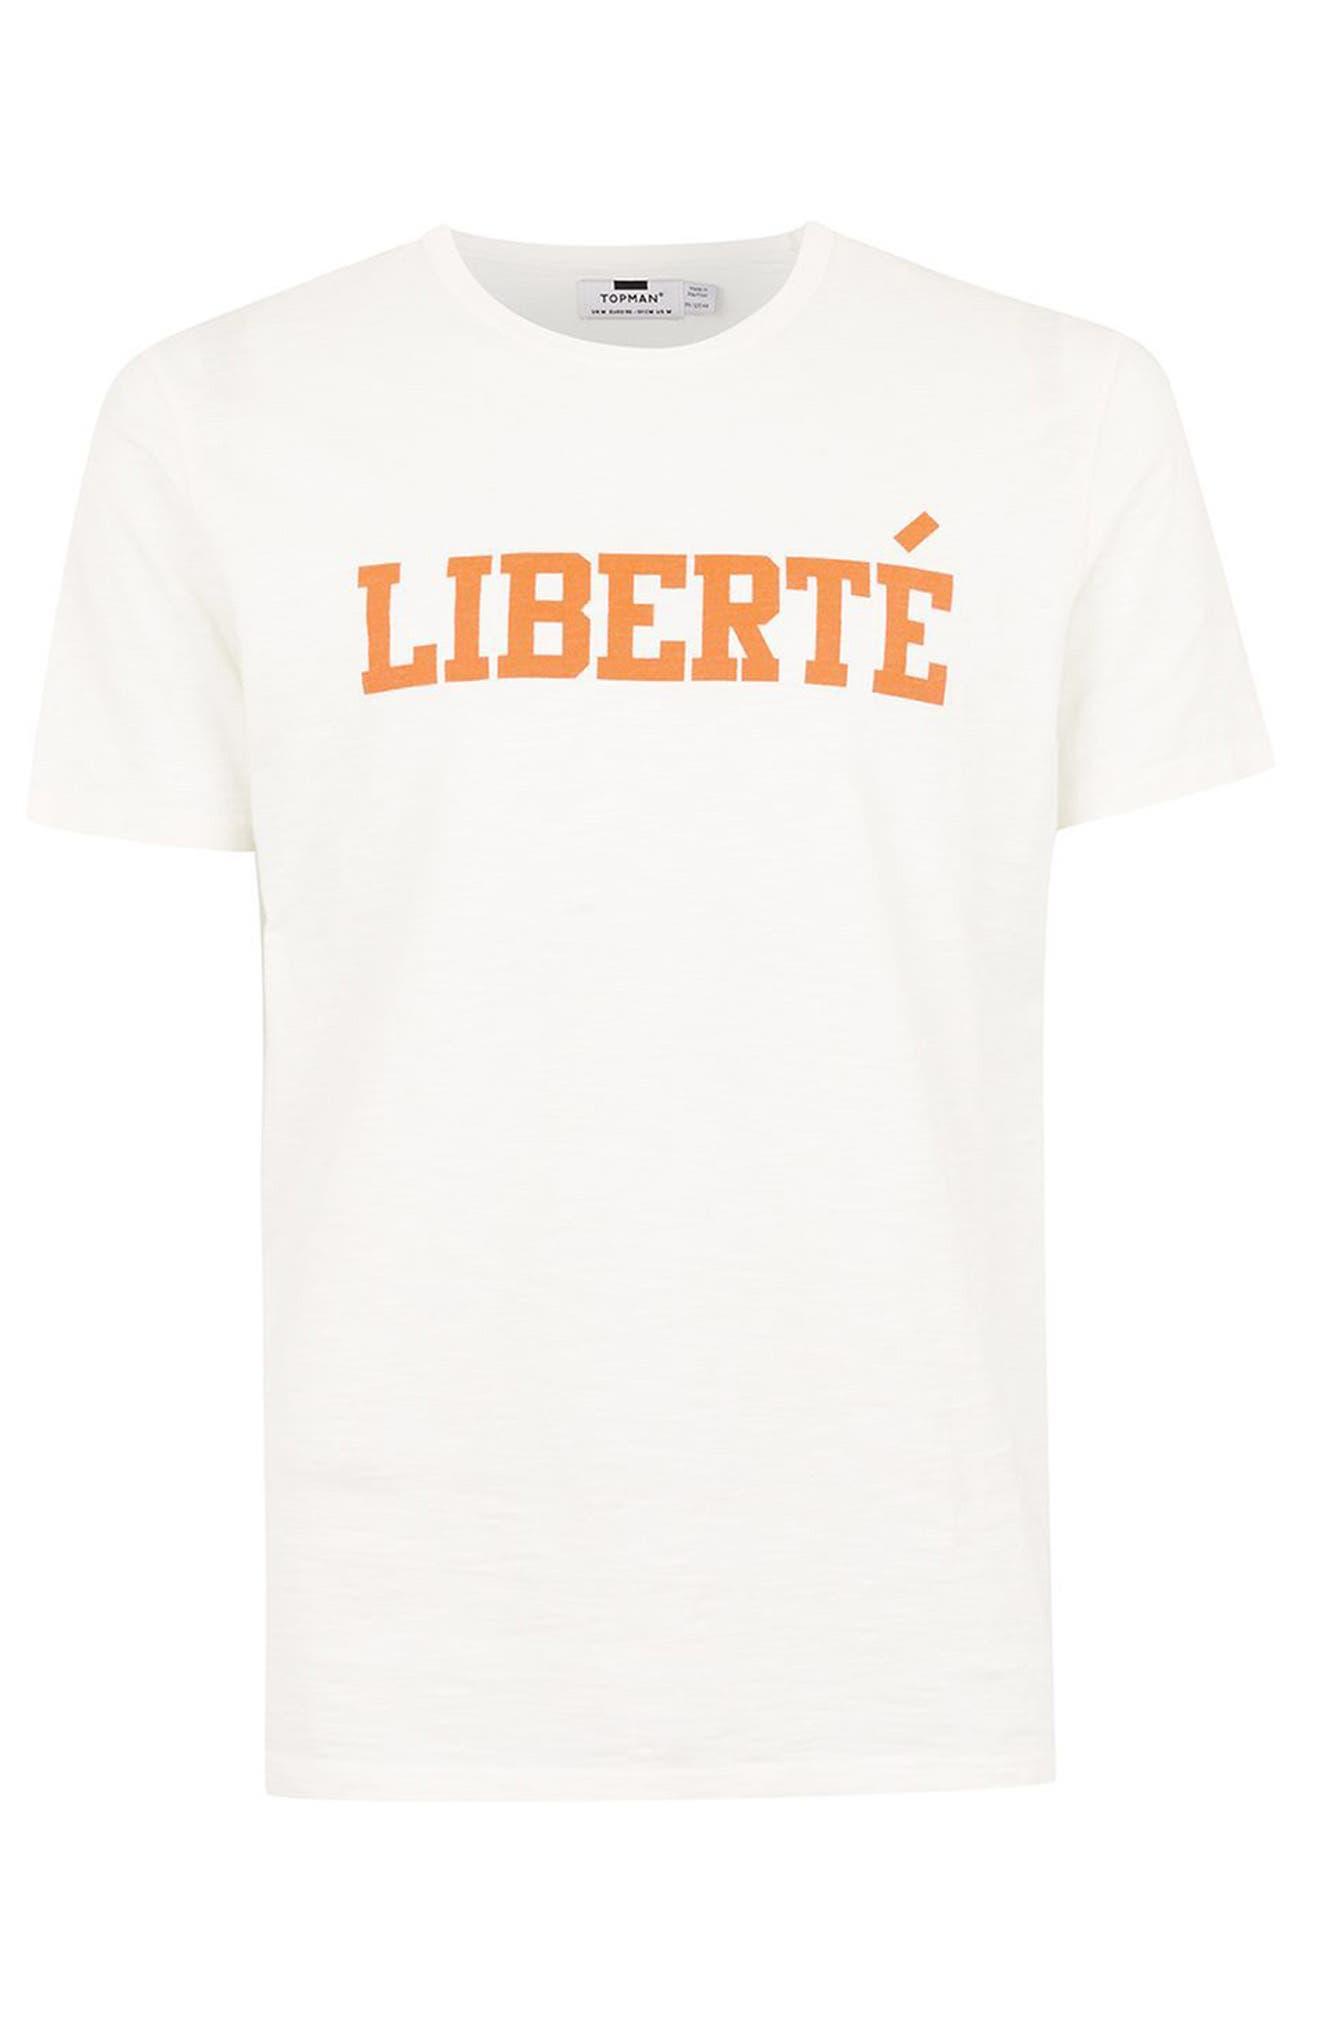 Liberté Graphic T-Shirt,                             Alternate thumbnail 4, color,                             White Multi